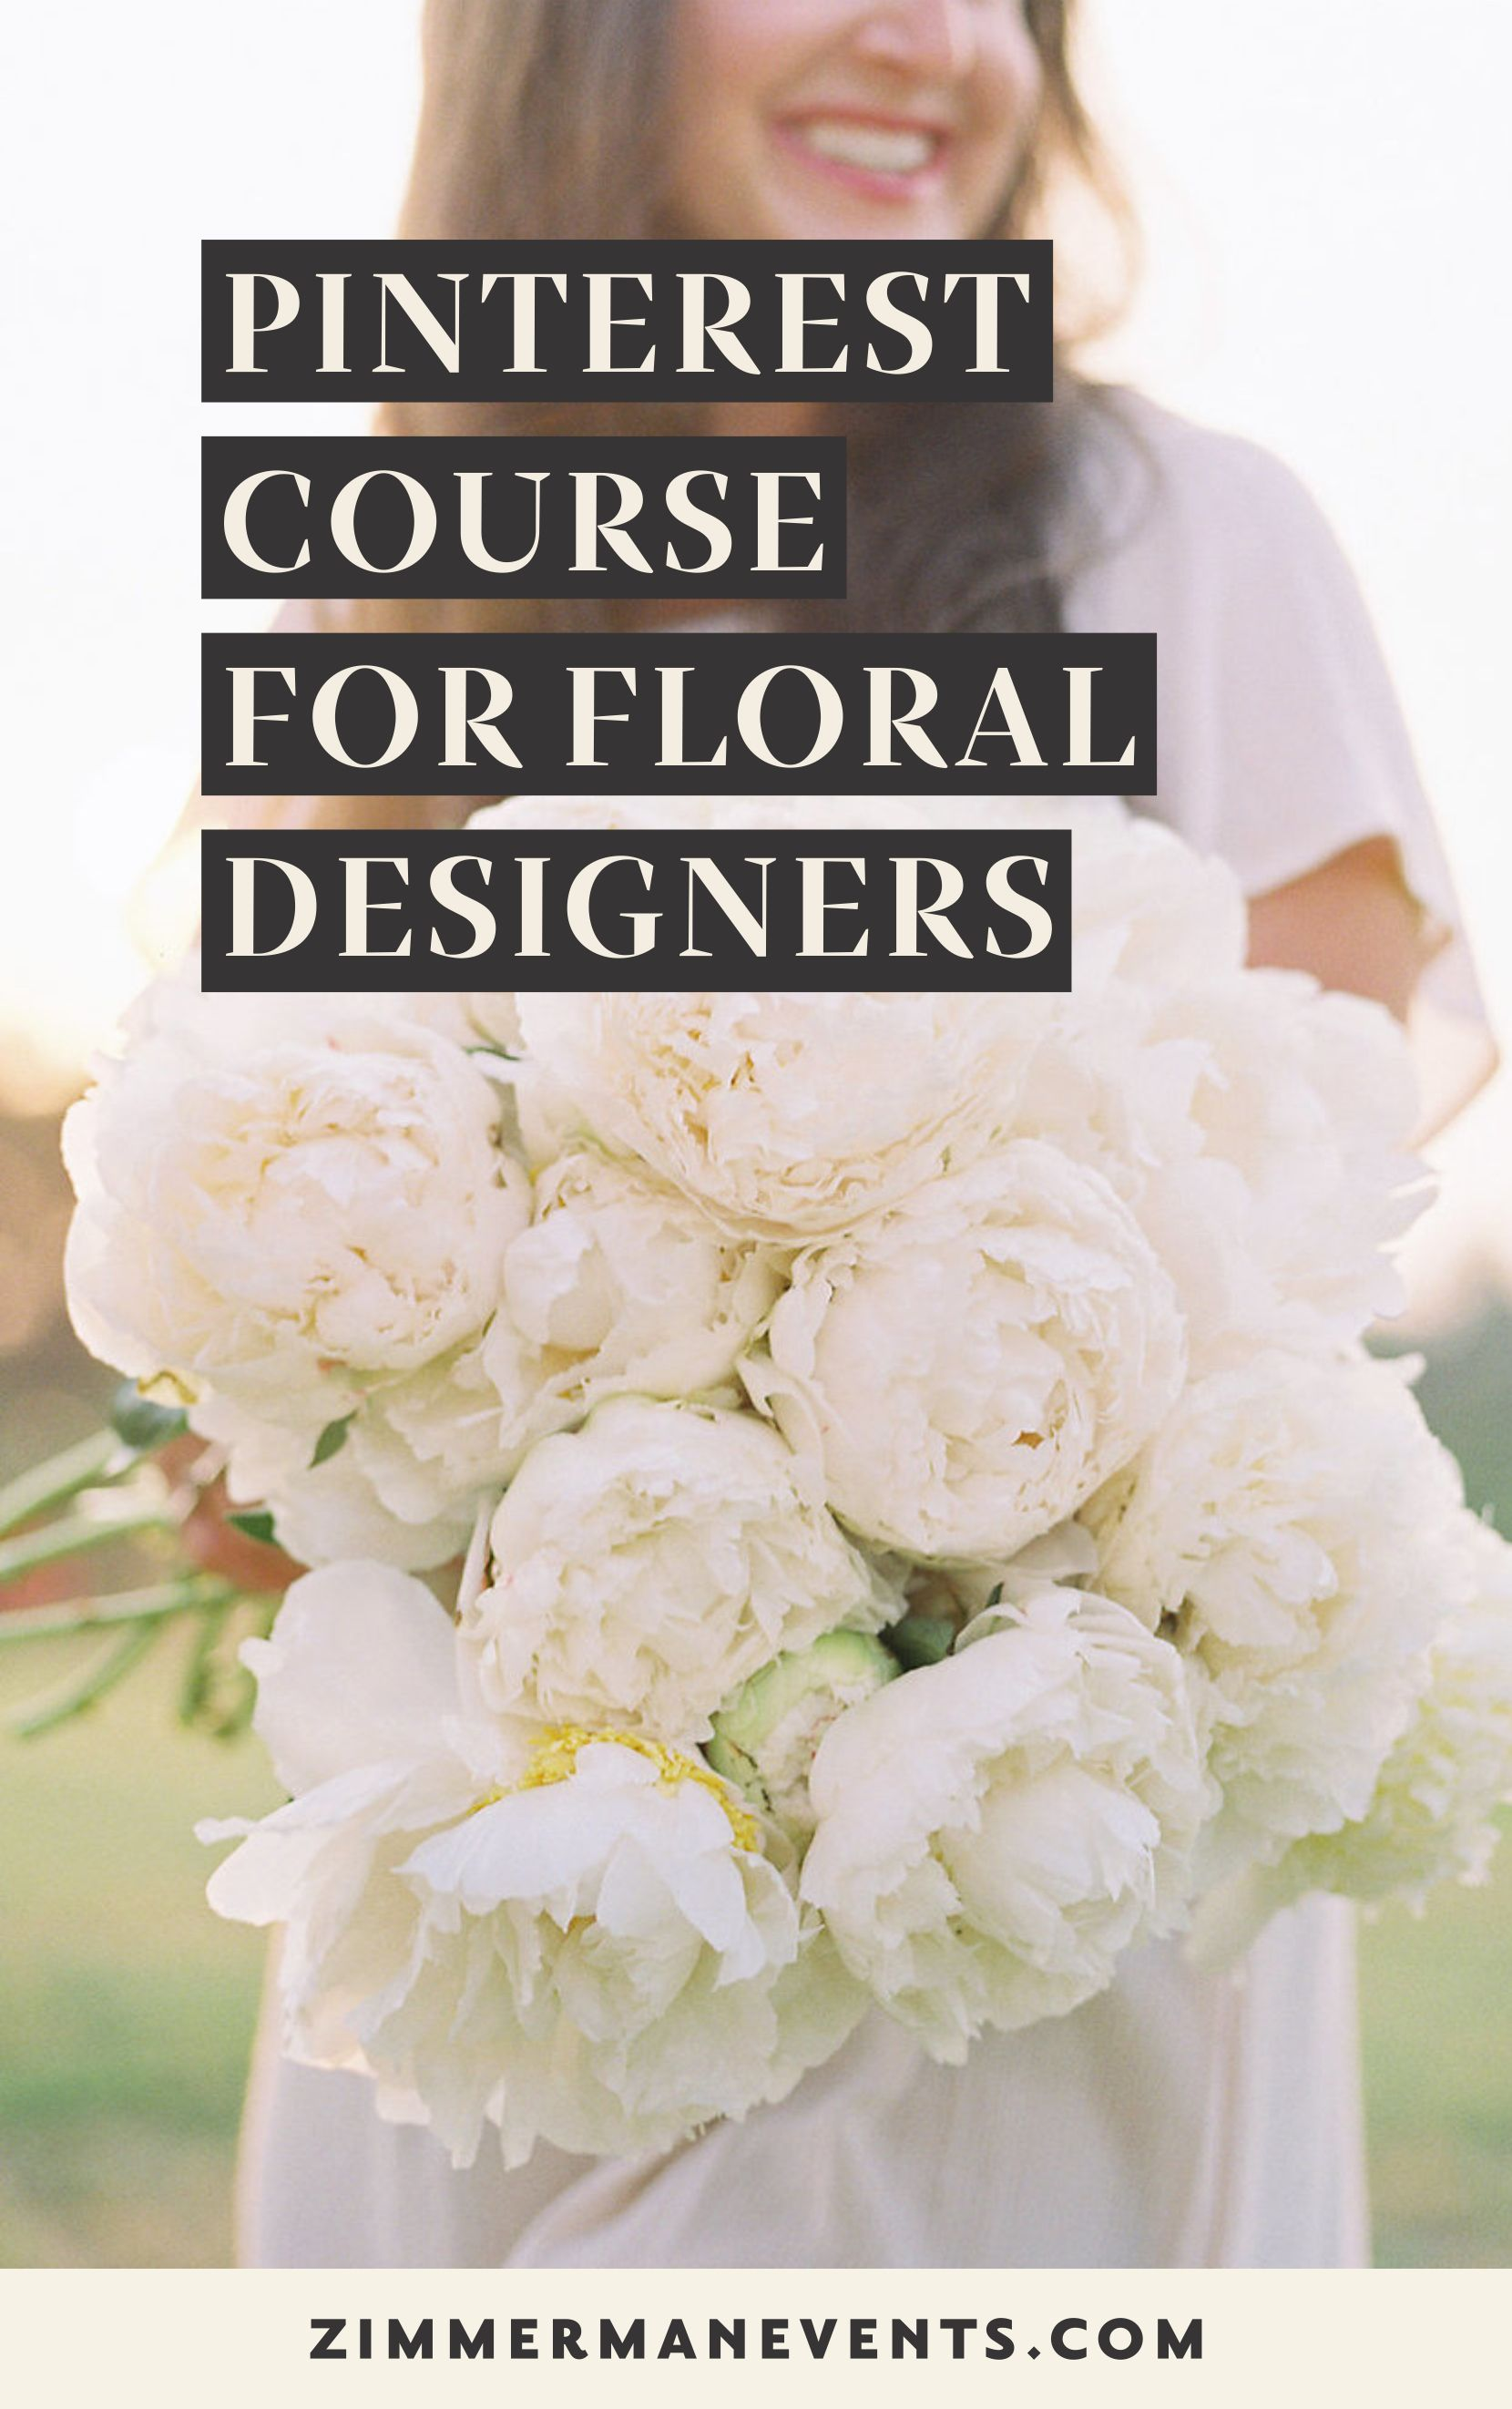 Pinterest Course For Floral Designers Wedding Planner Business Wedding Planning Business Wedding